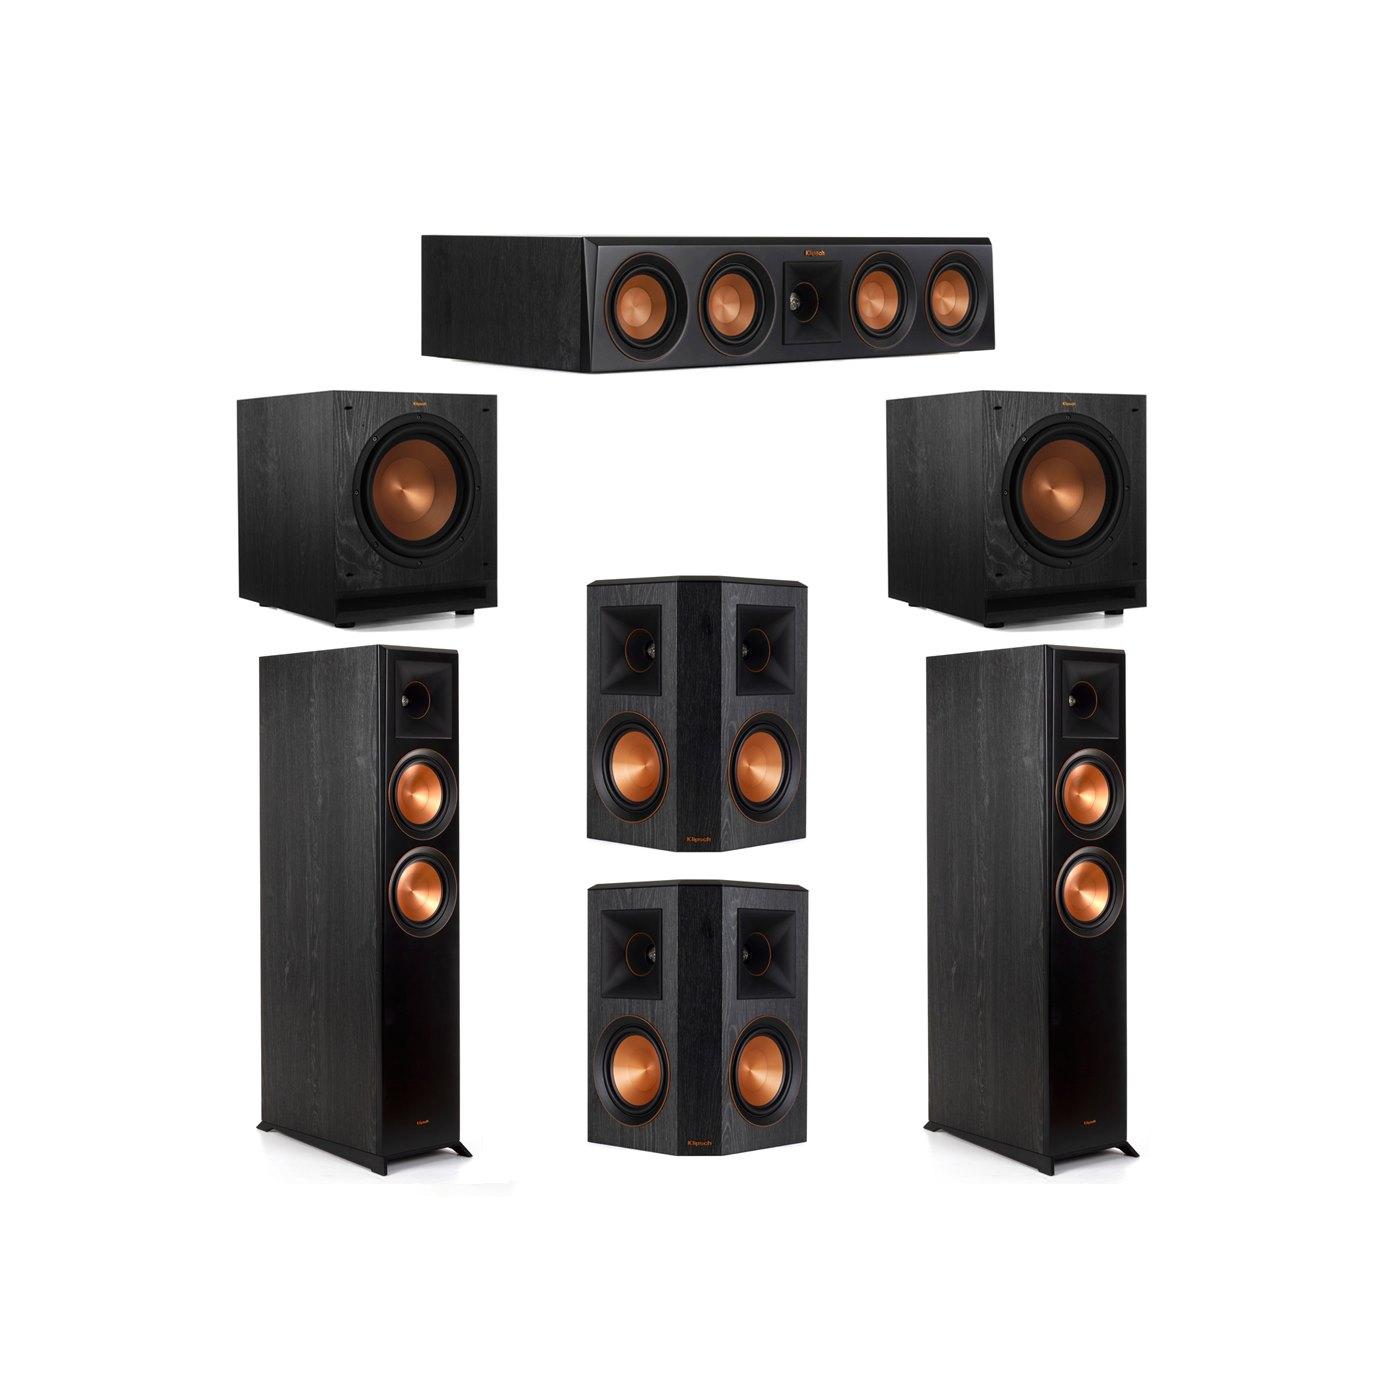 Klipsch 5.2 System with 2 RP-6000F Floorstanding Speakers, 1 Klipsch RP-404C Center Speaker, 2 Klipsch RP-502S Surround Speakers, 2 Klipsch SPL-100 Subwoofers